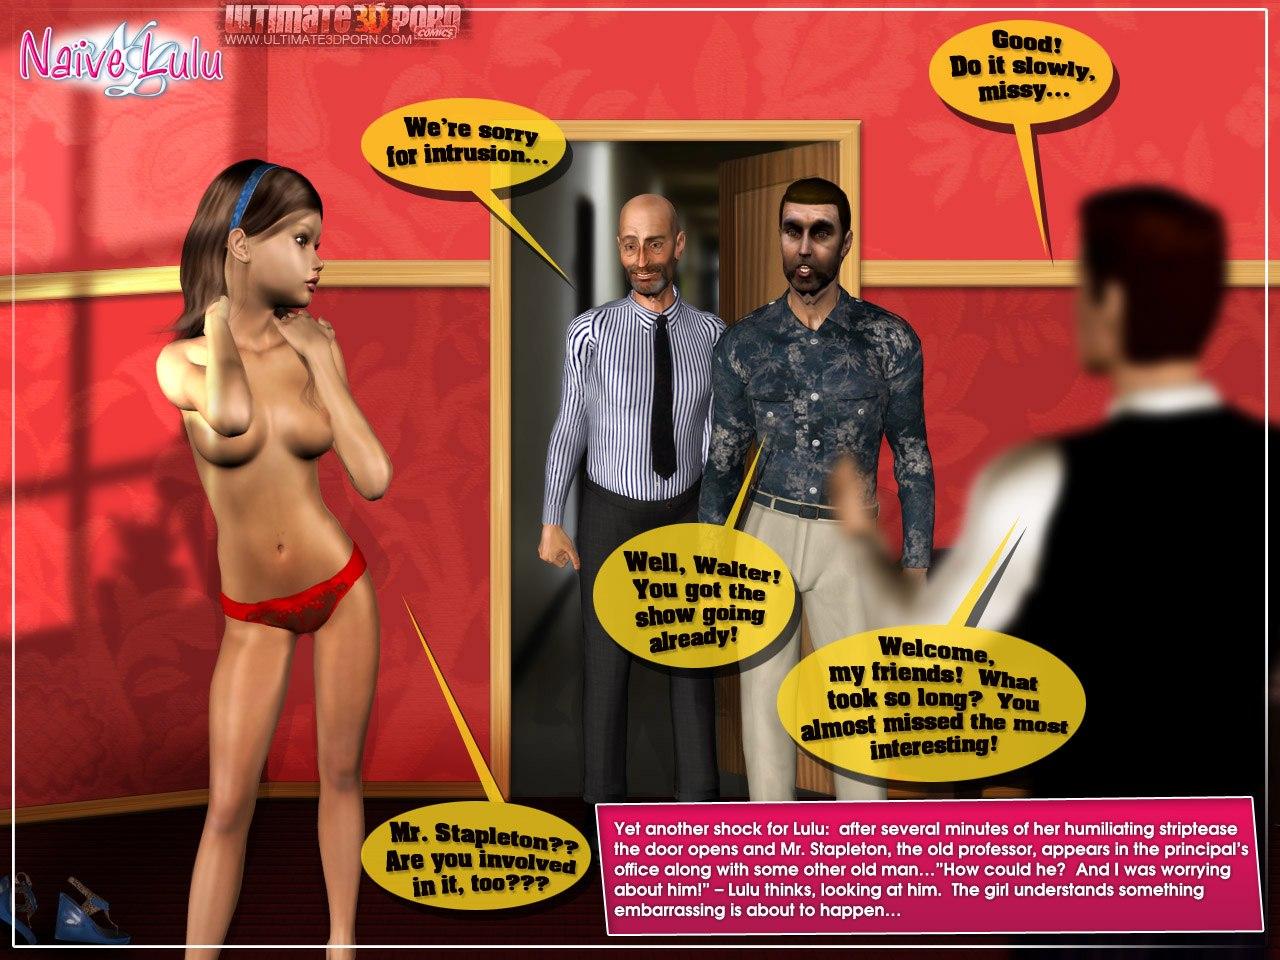 Naive Lulu 1- Ultimate 3D Porn - part 4